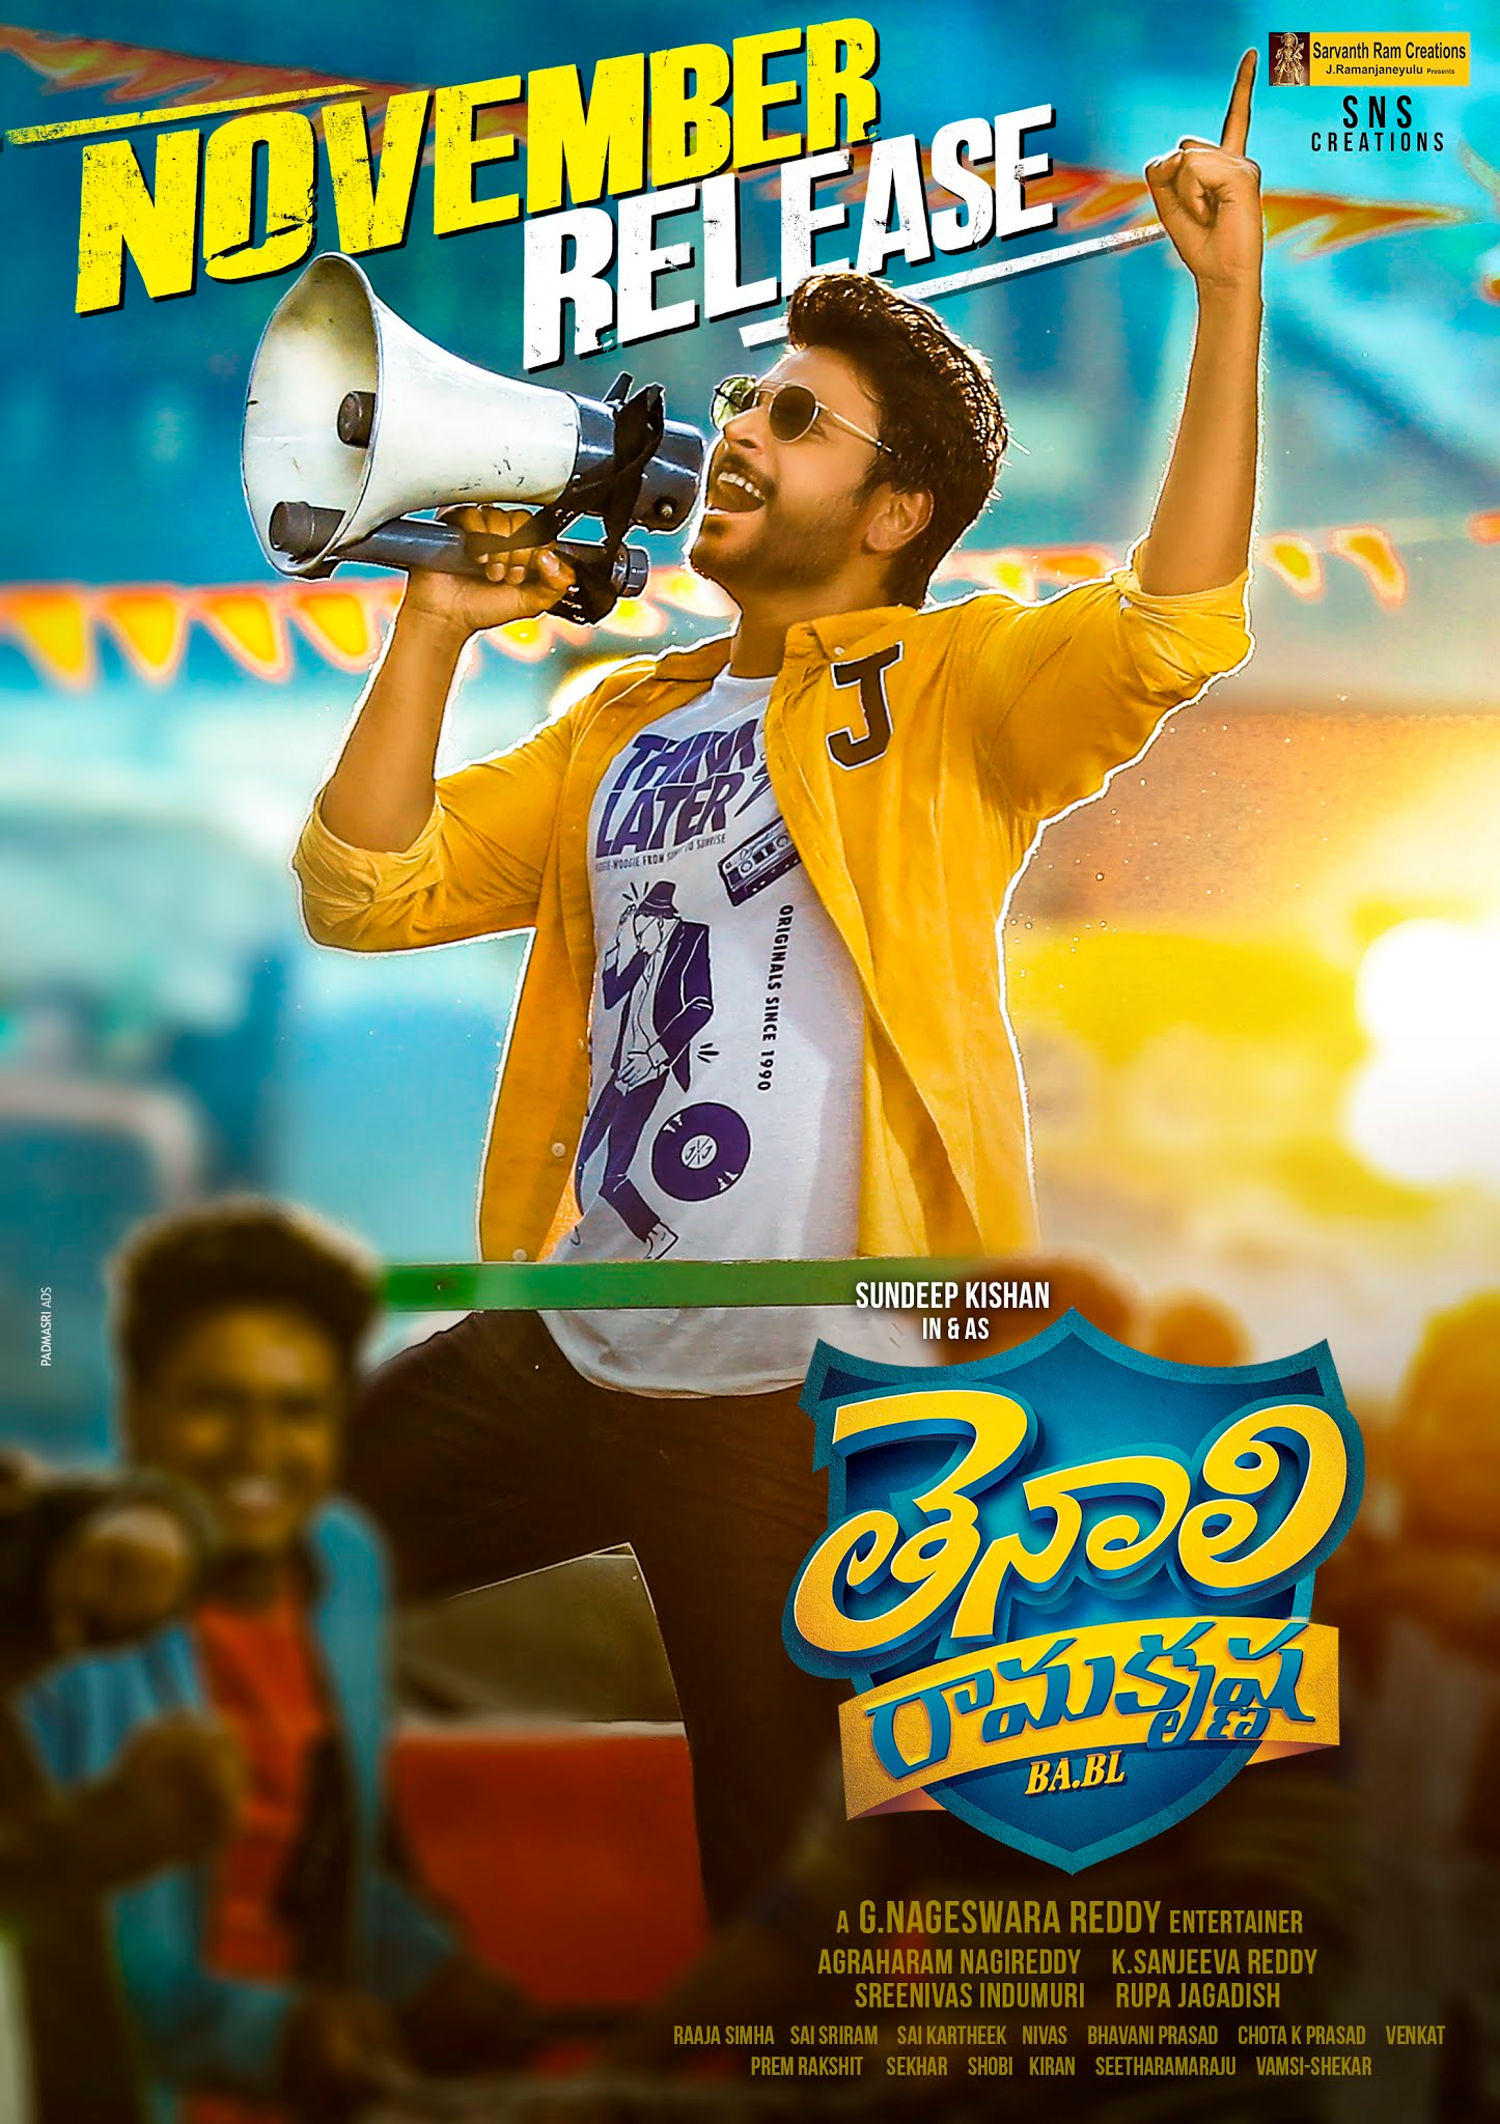 Sundeep Kishan Tenali Ramakrishna BA BL Movie Release in November